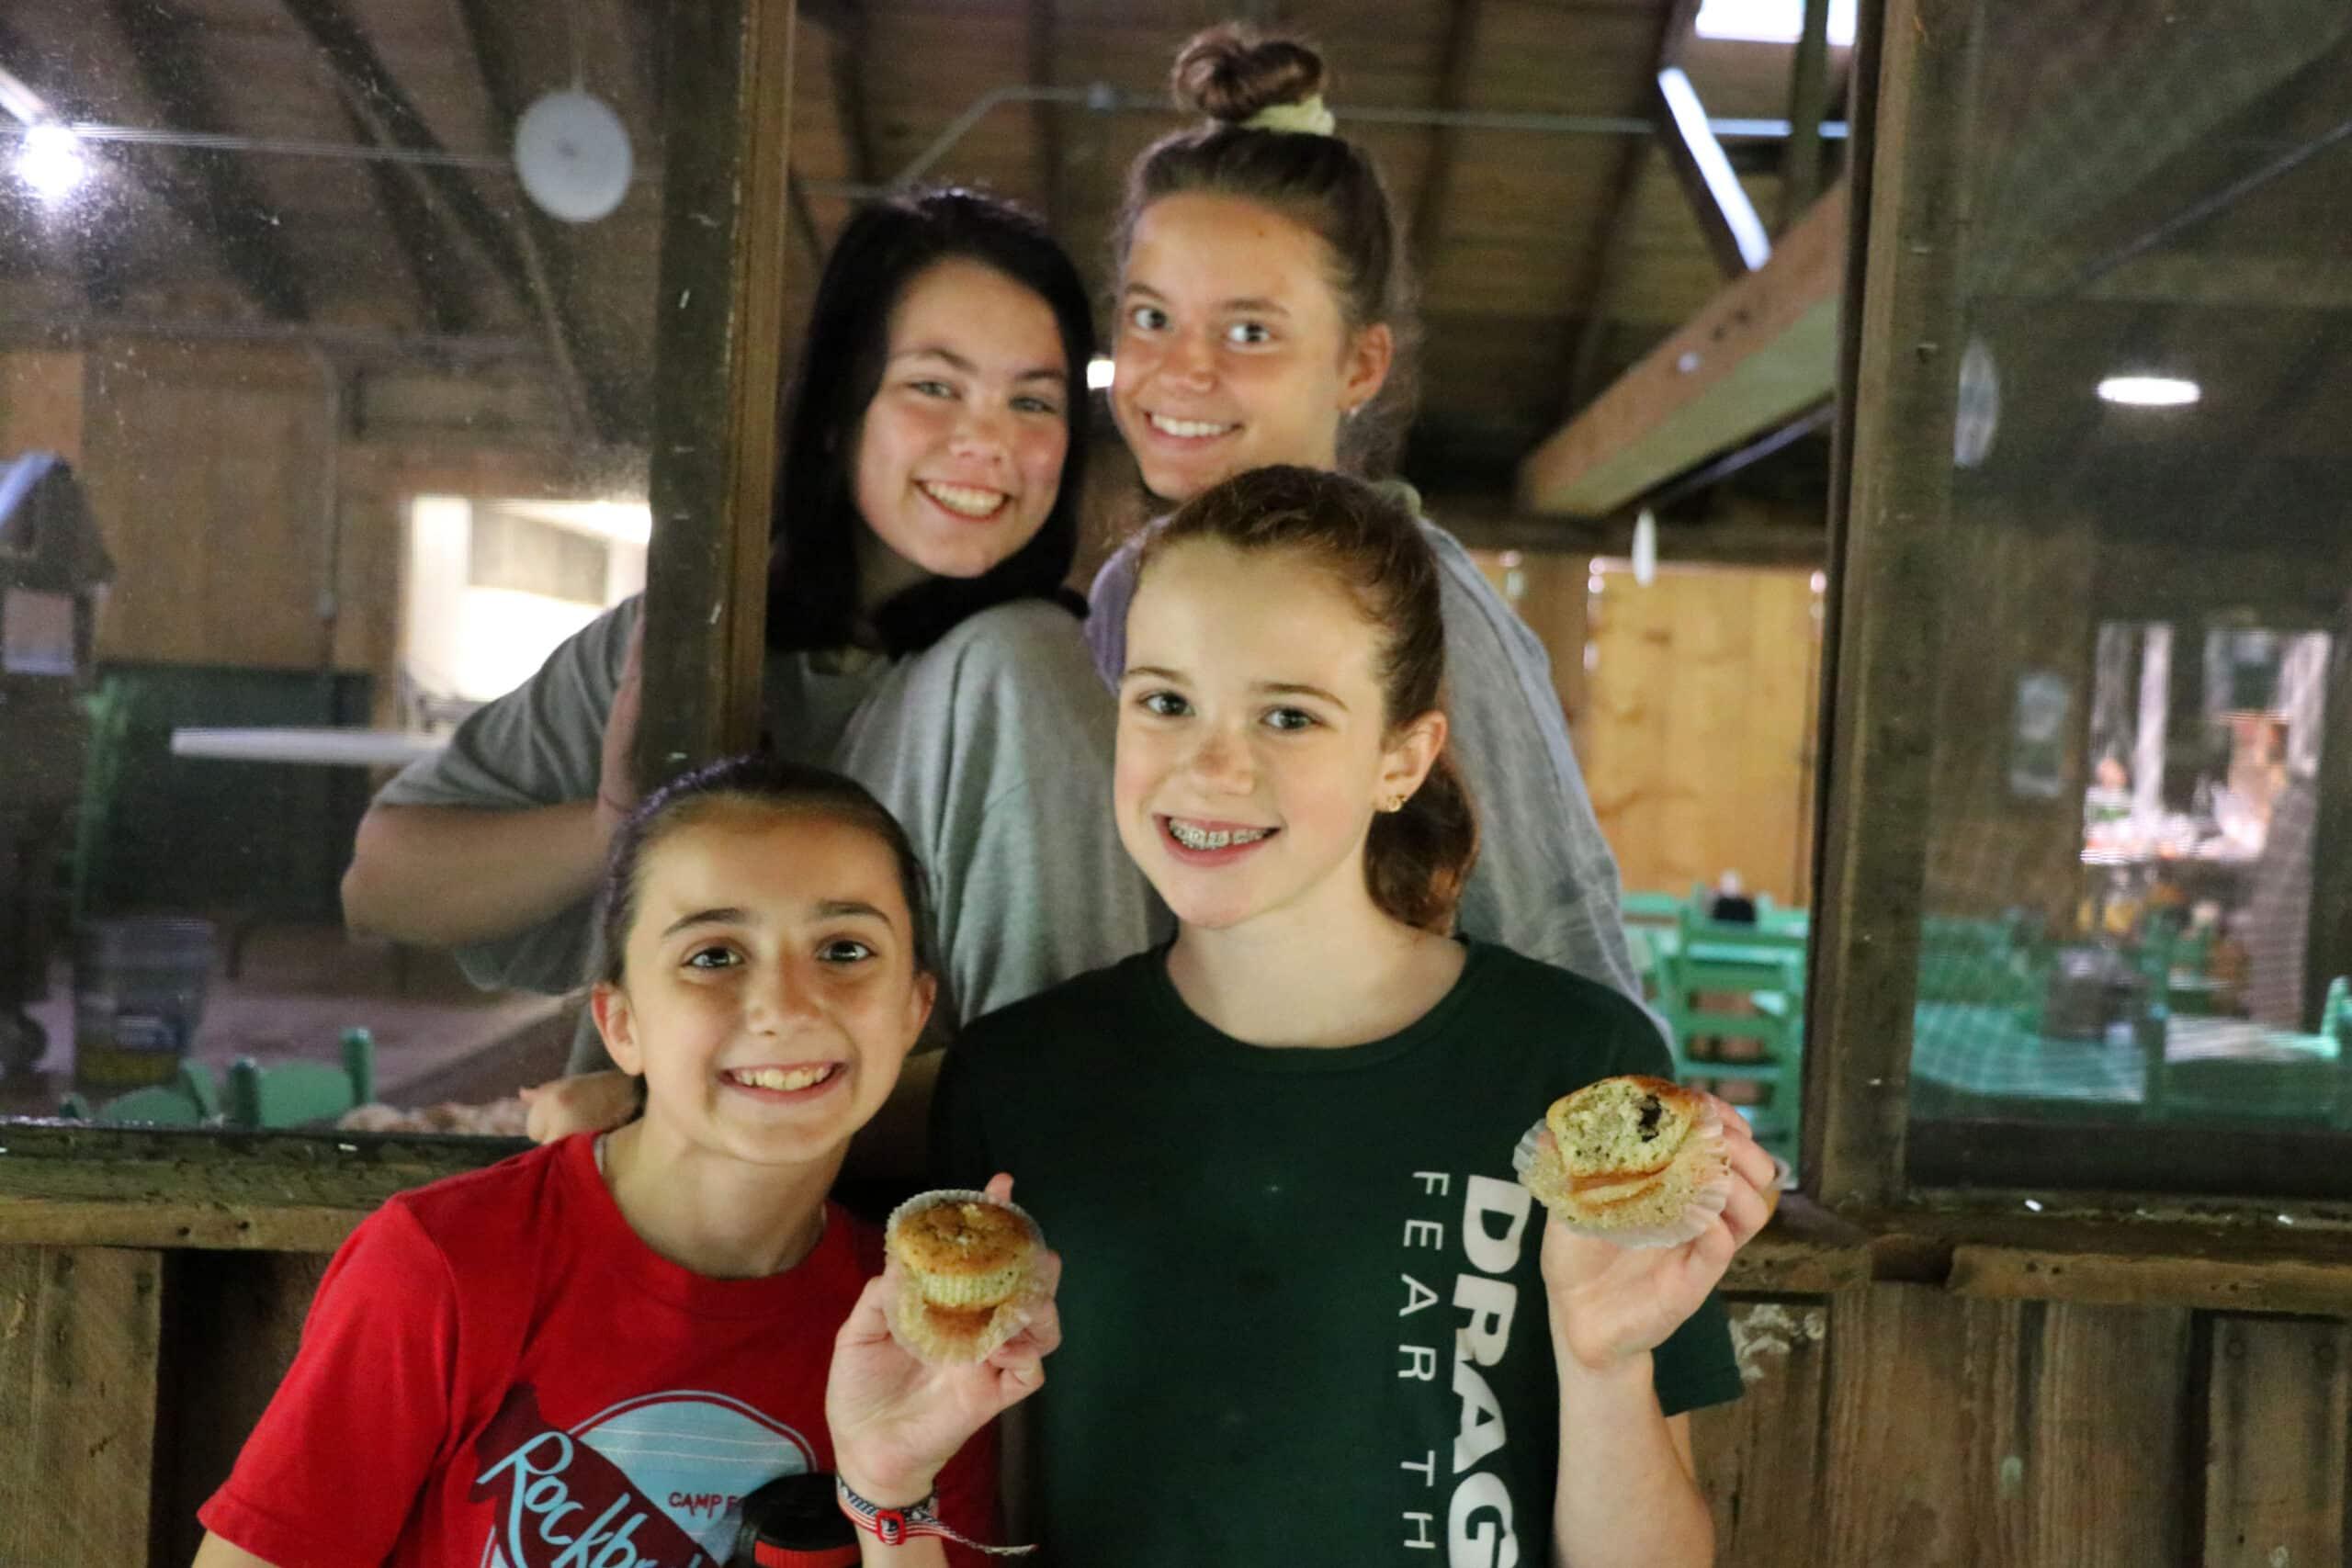 girls eating muffins at camp